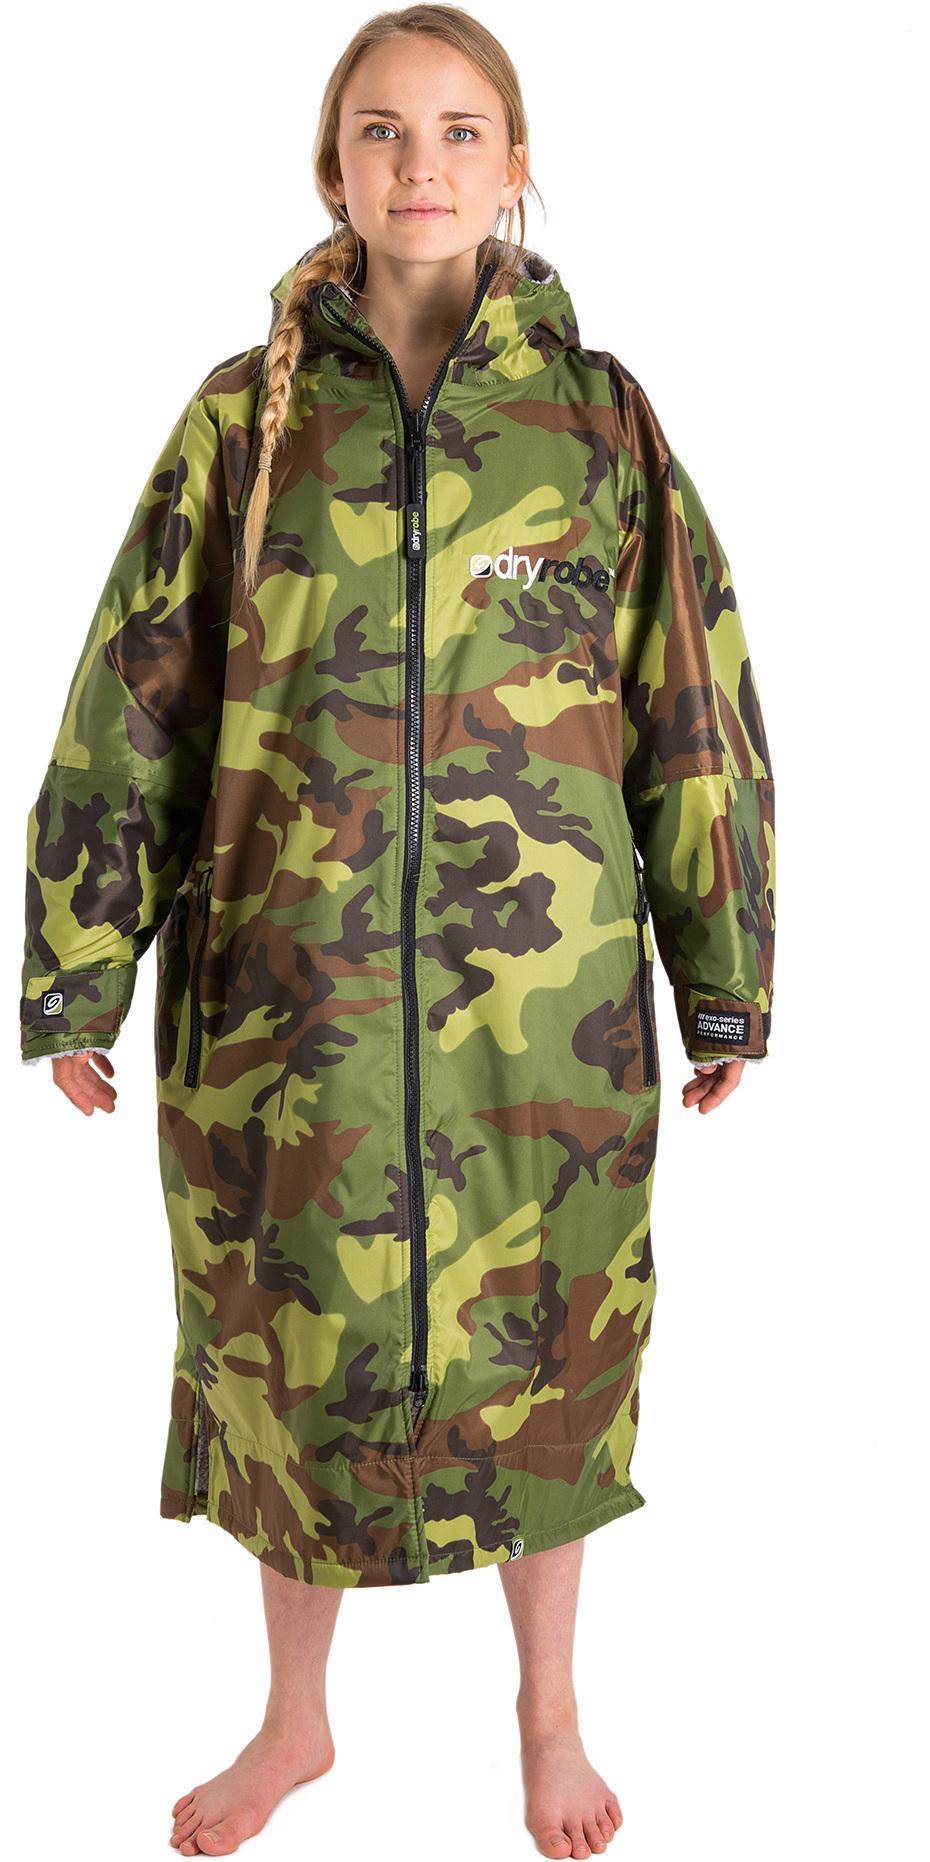 0c9a33cb0c 2018 Dryrobe Advance - Long Sleeve Premium Outdoor Change Robe DR104 - S  Camo   Grey ...